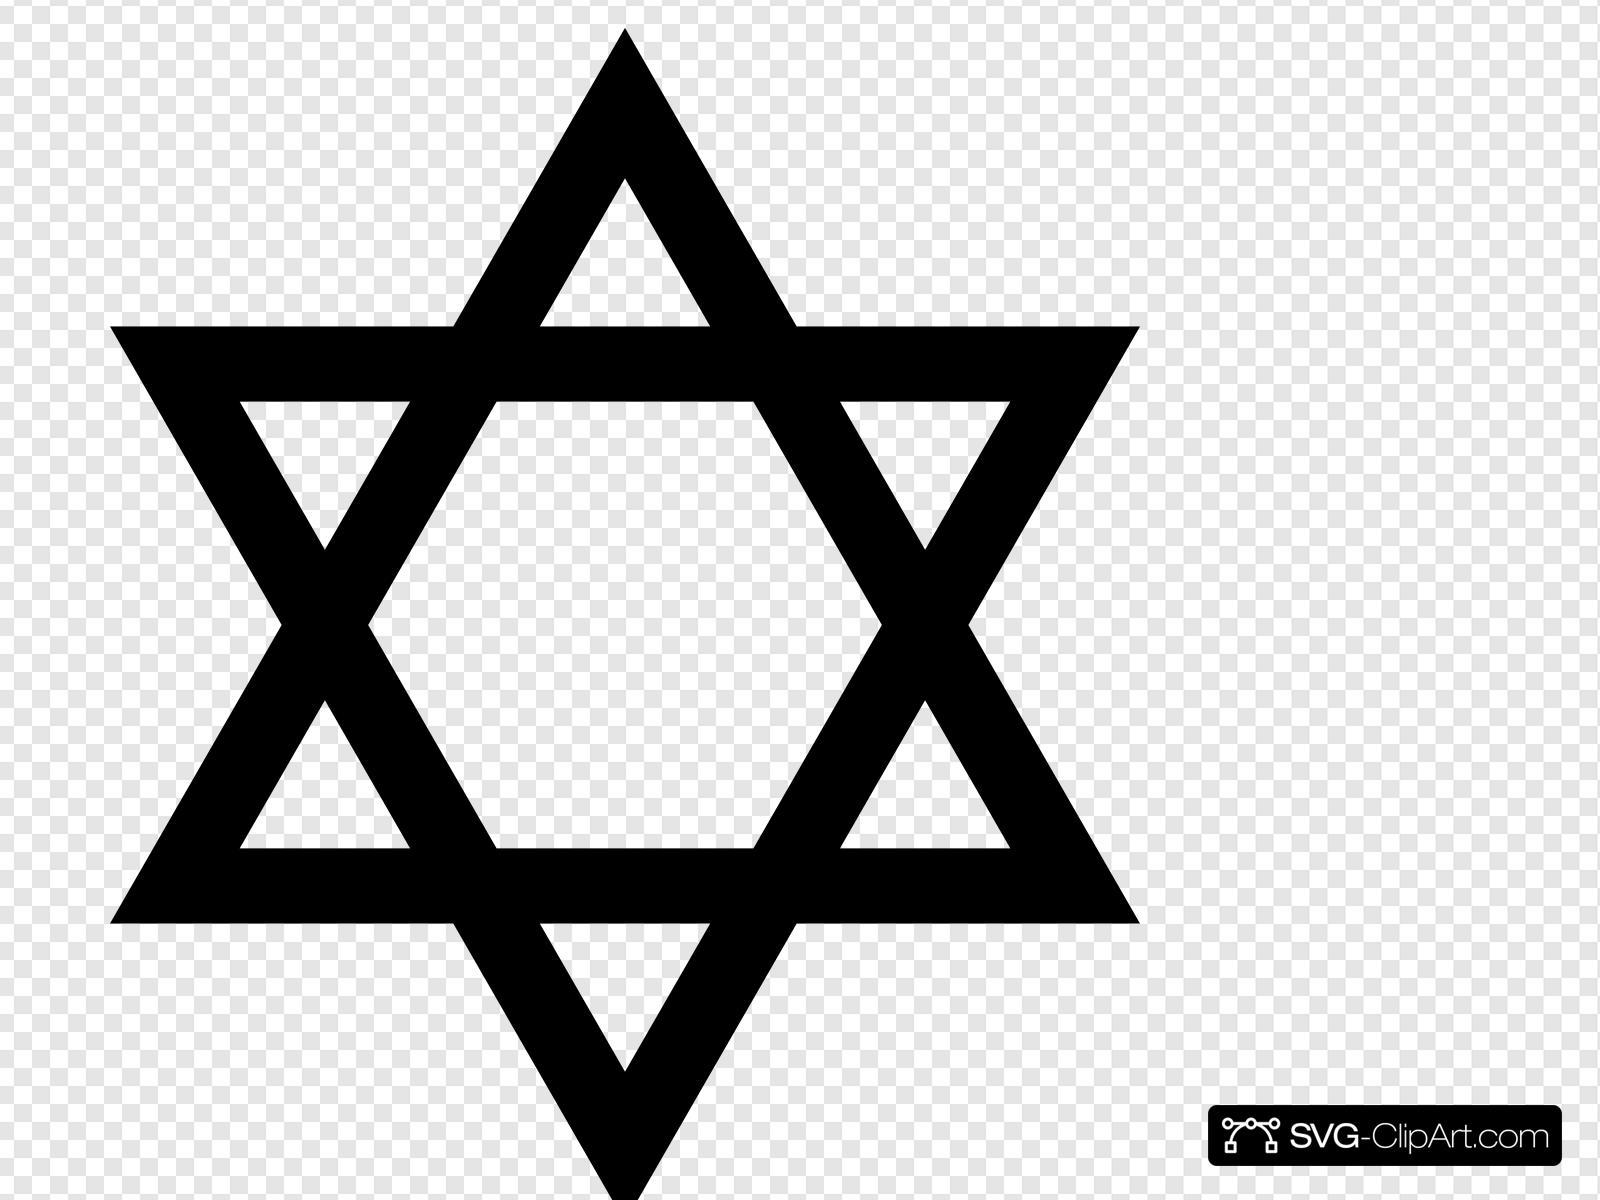 Jewish Star Clip art, Icon and SVG.